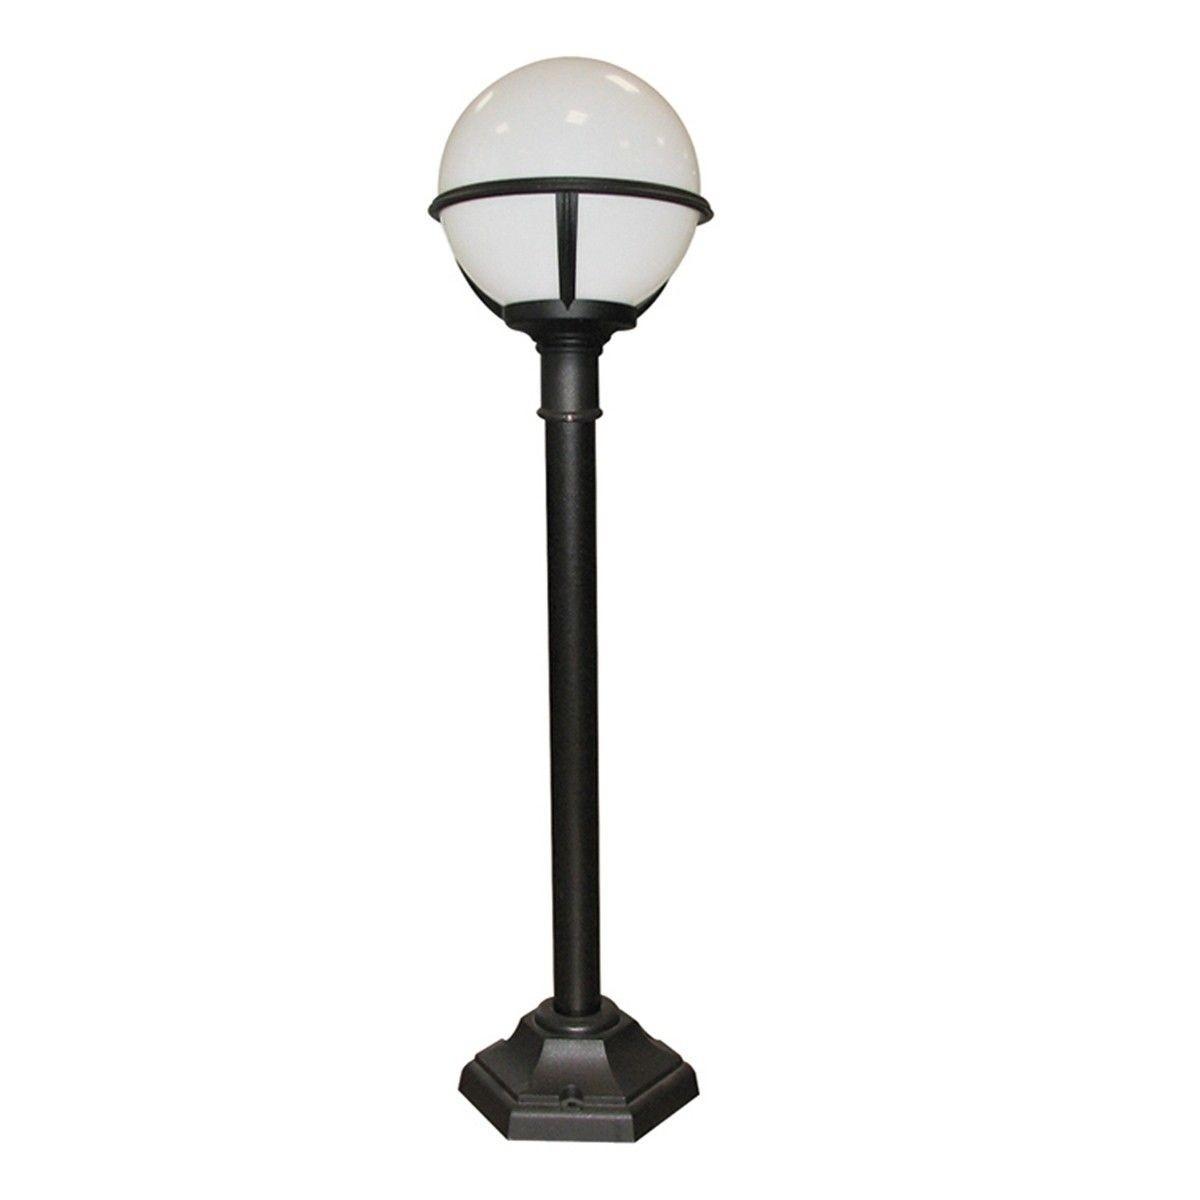 Outdoor l& post globes 1  sc 1 st  Foter & Outdoor Lamp Post Globes - Foter